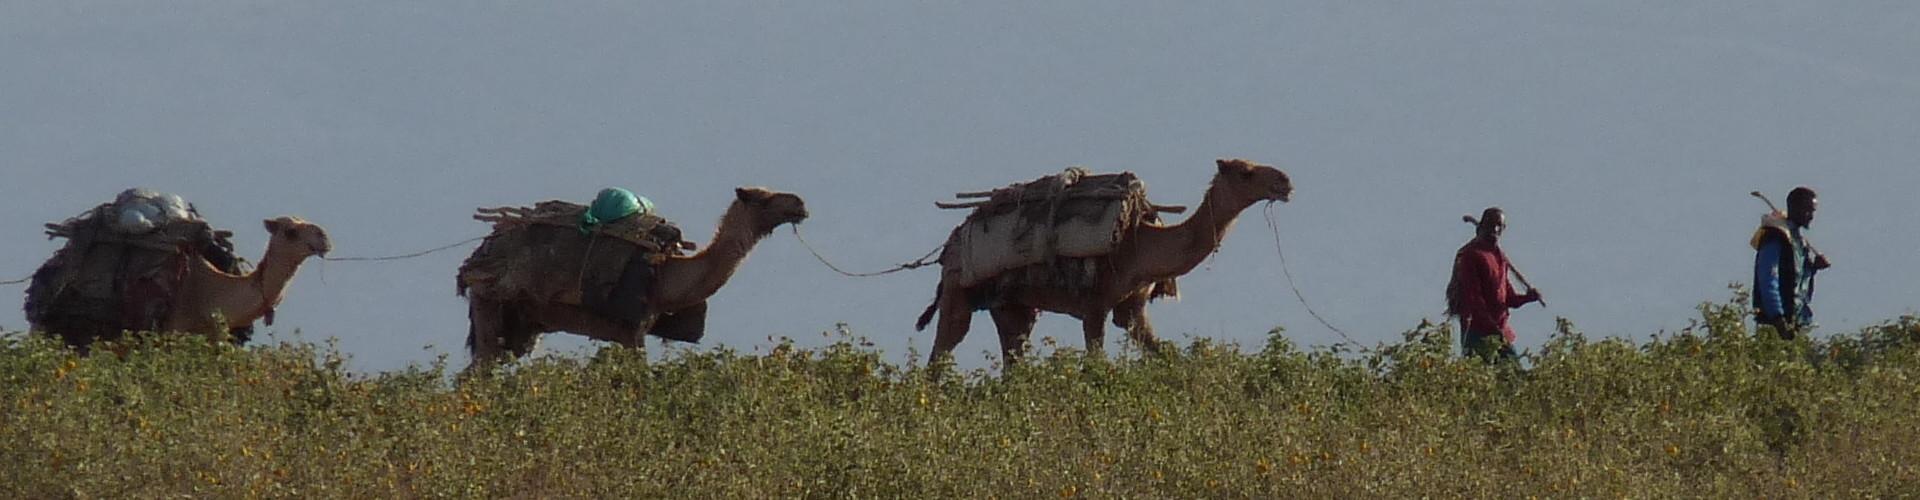 Ethiopia Somali Region